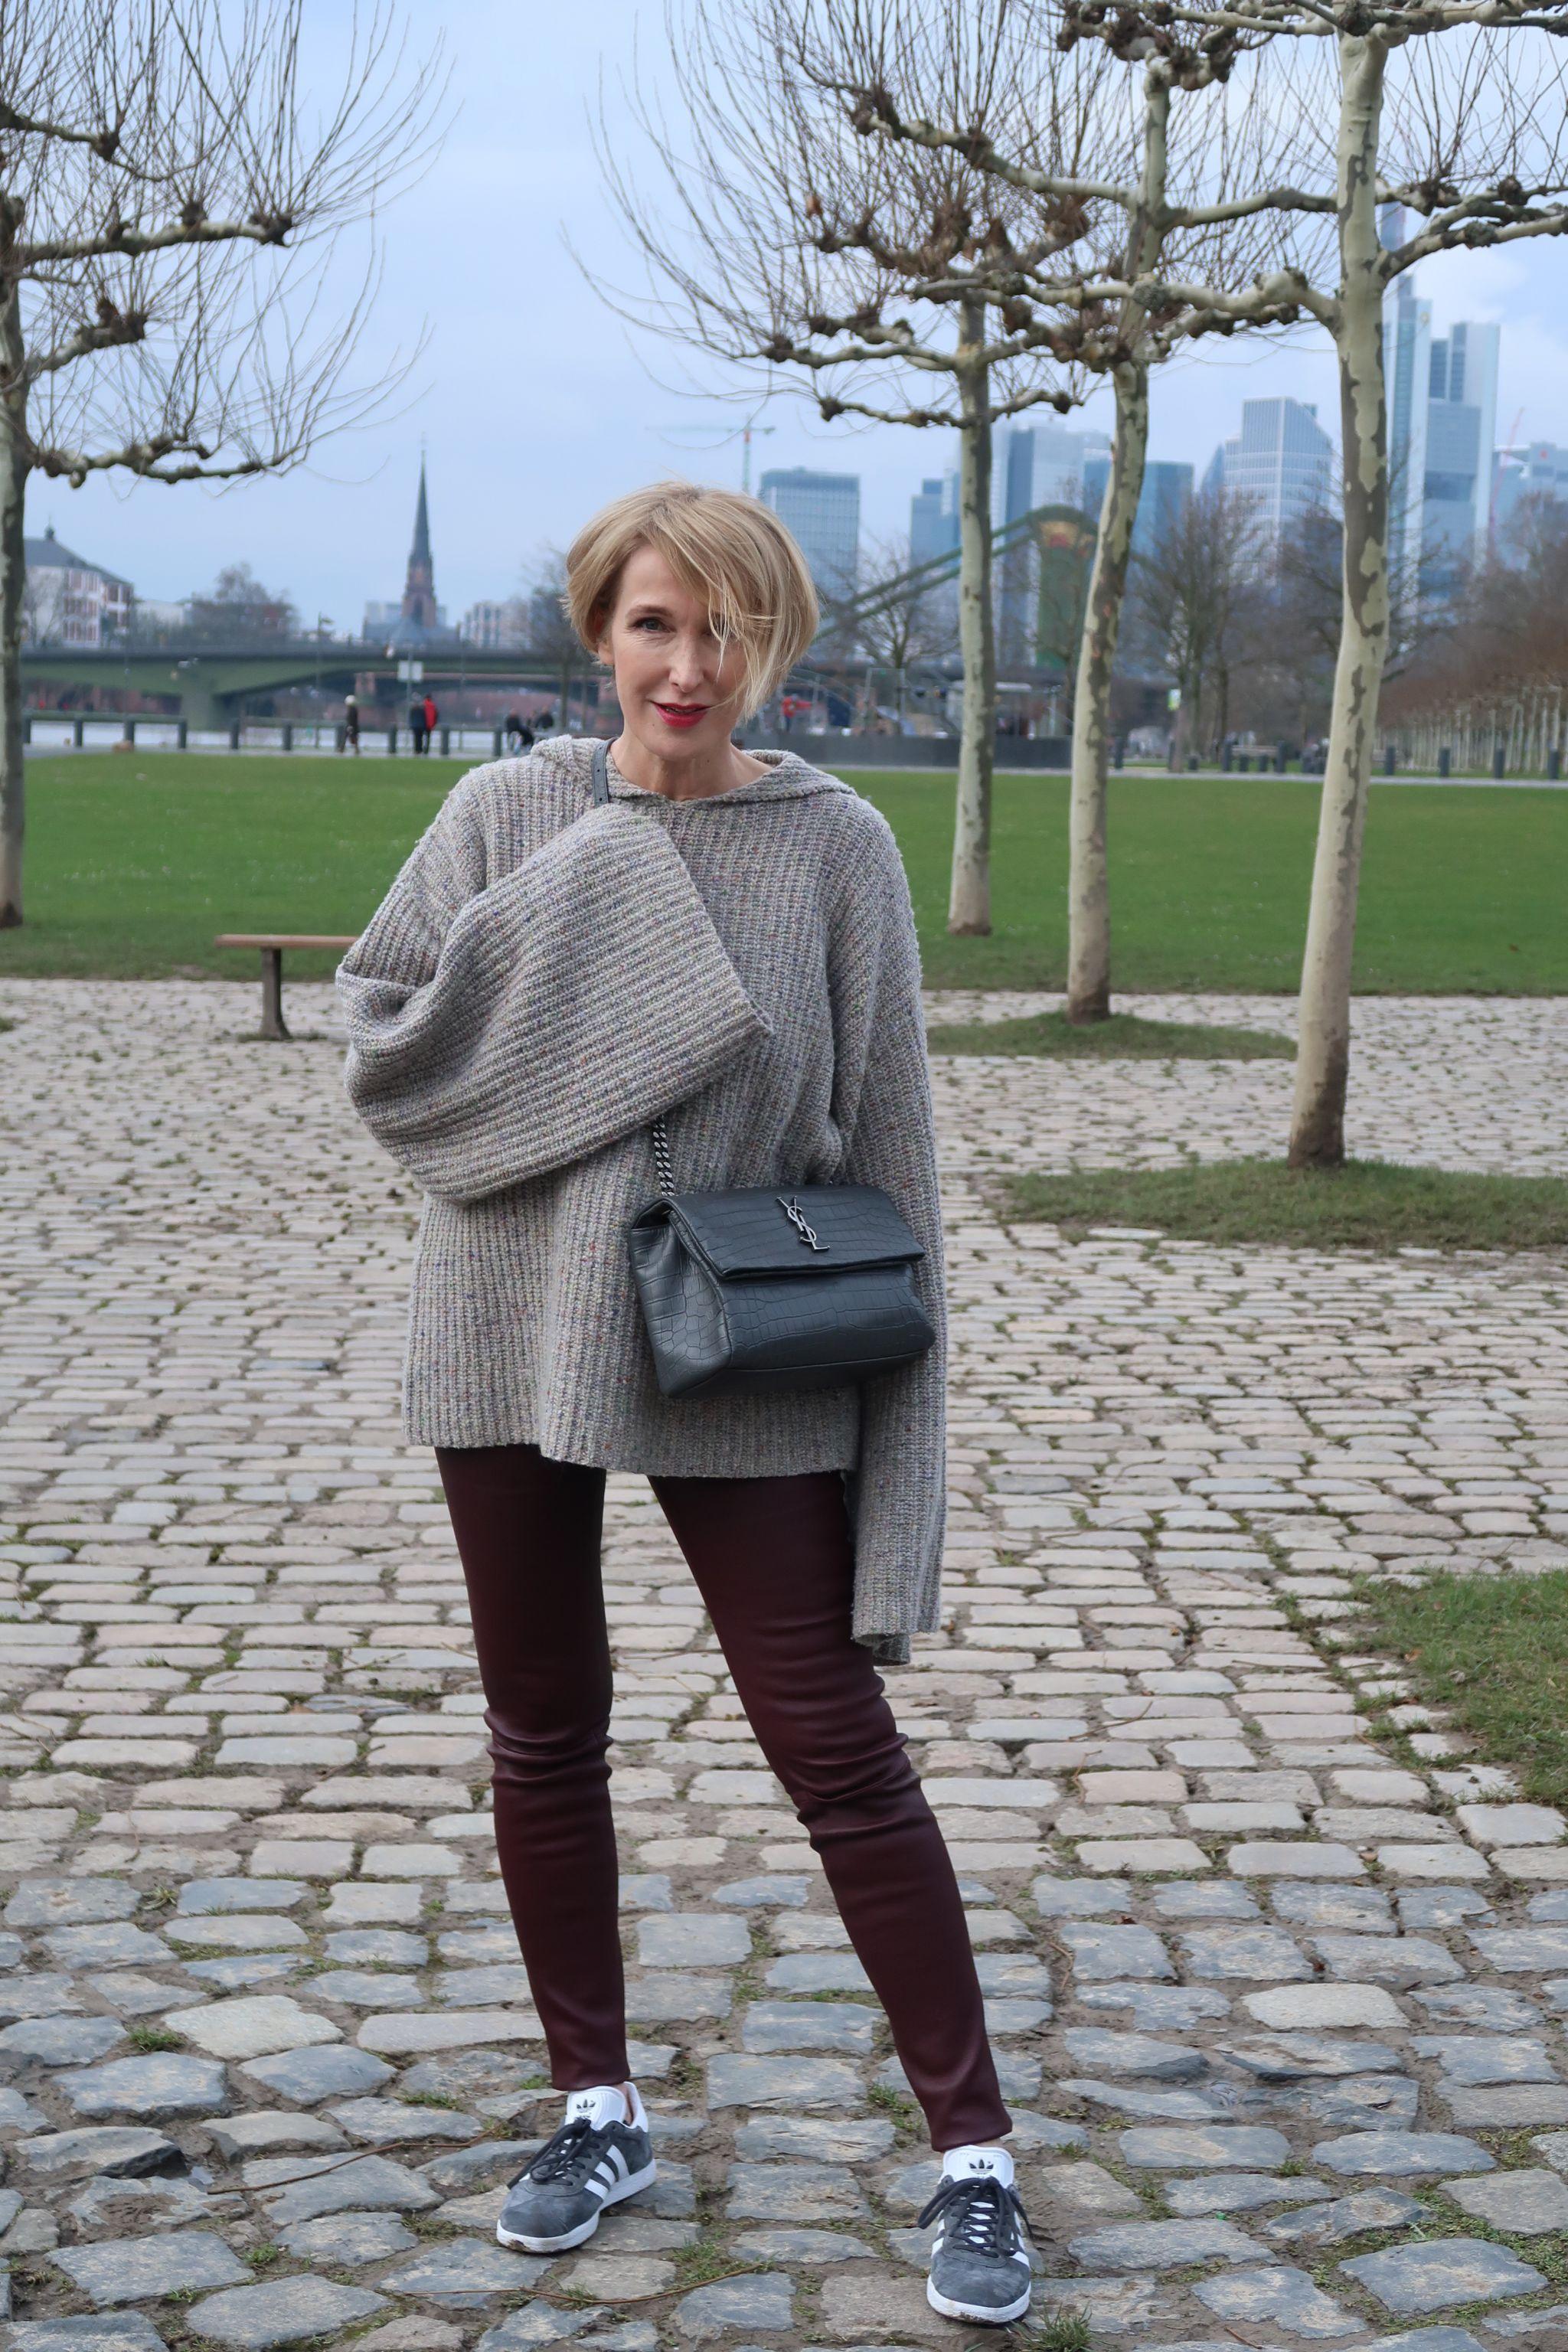 glamupyourlifestyle statement-Aermel Pullover Kaschmir allude-Cashmere lederleggings ue40-Mode ue40-Blog